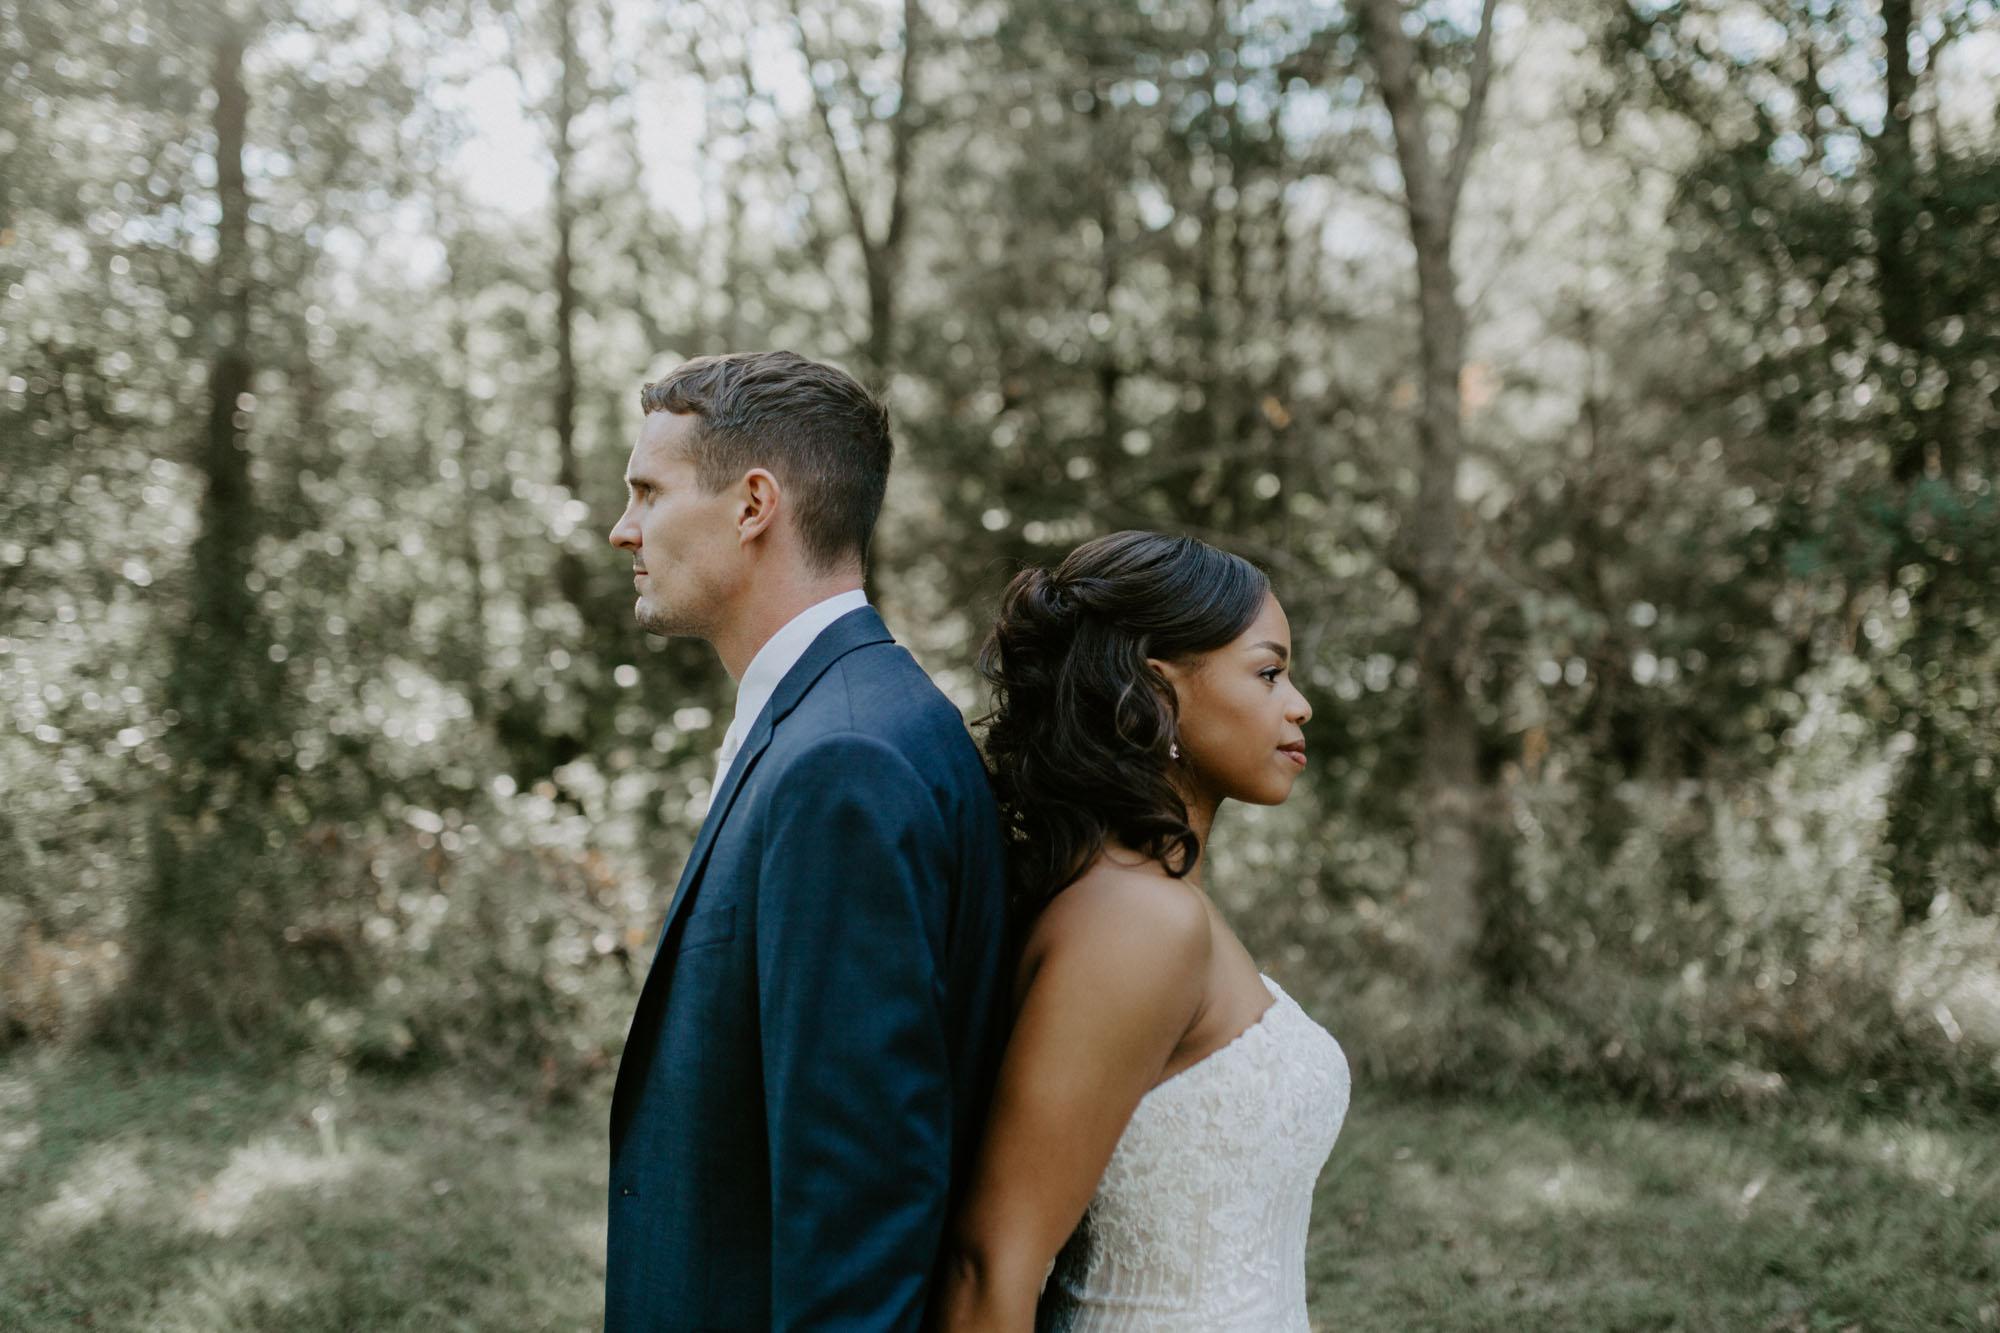 prairie_glass_house_wedding_champaign_wright_photographs_simon_0070.jpg